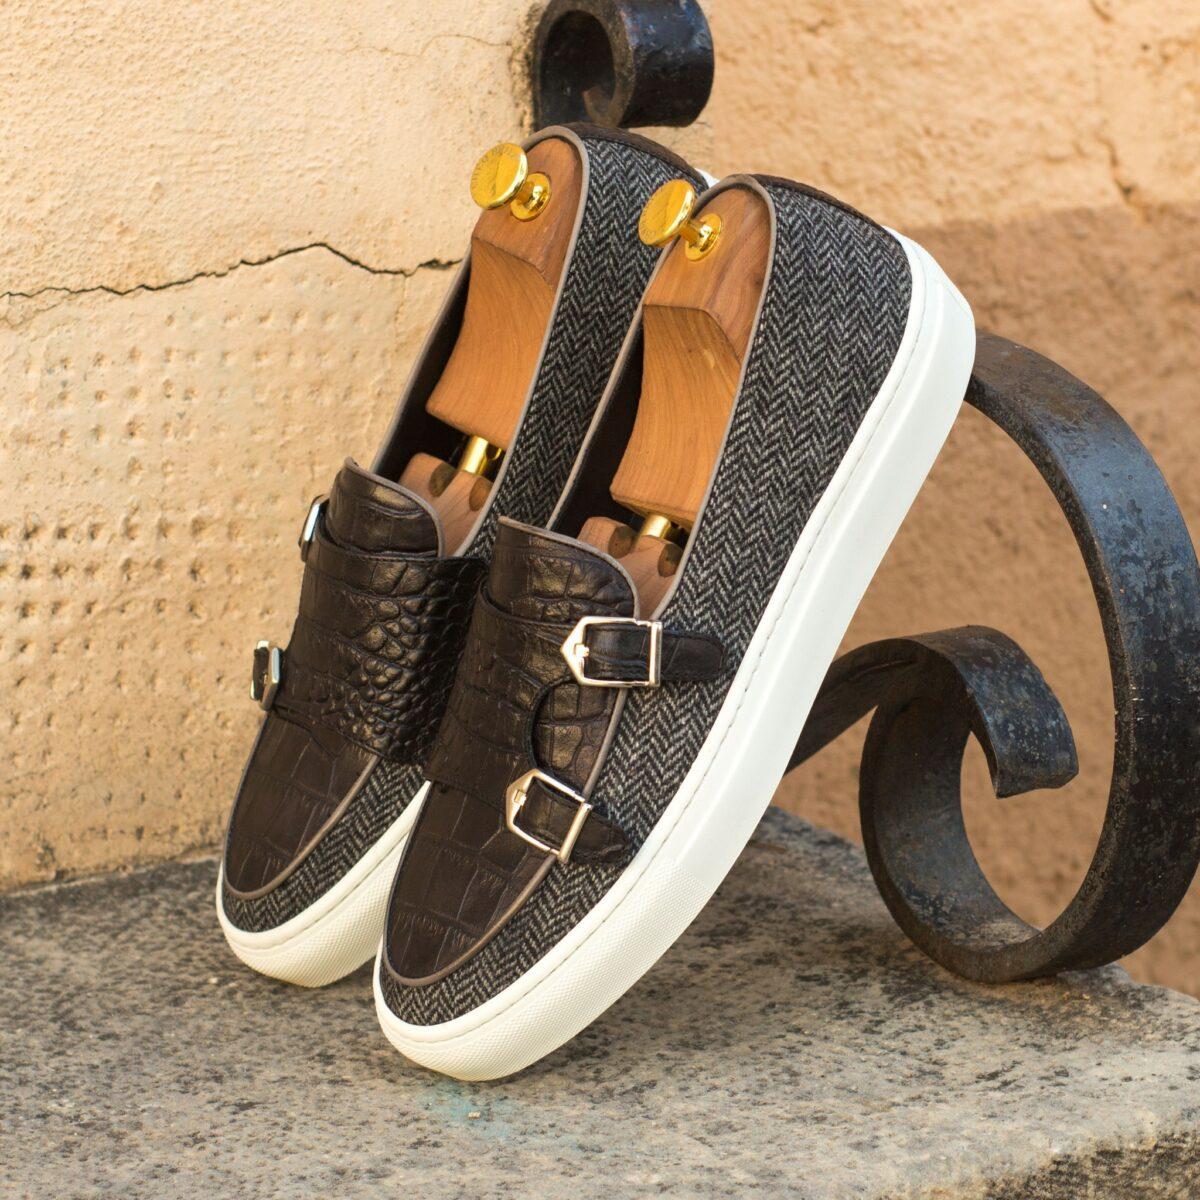 Custom Made Monk Sneakers in Herringbone with Black Croco and Grey Painted Calf